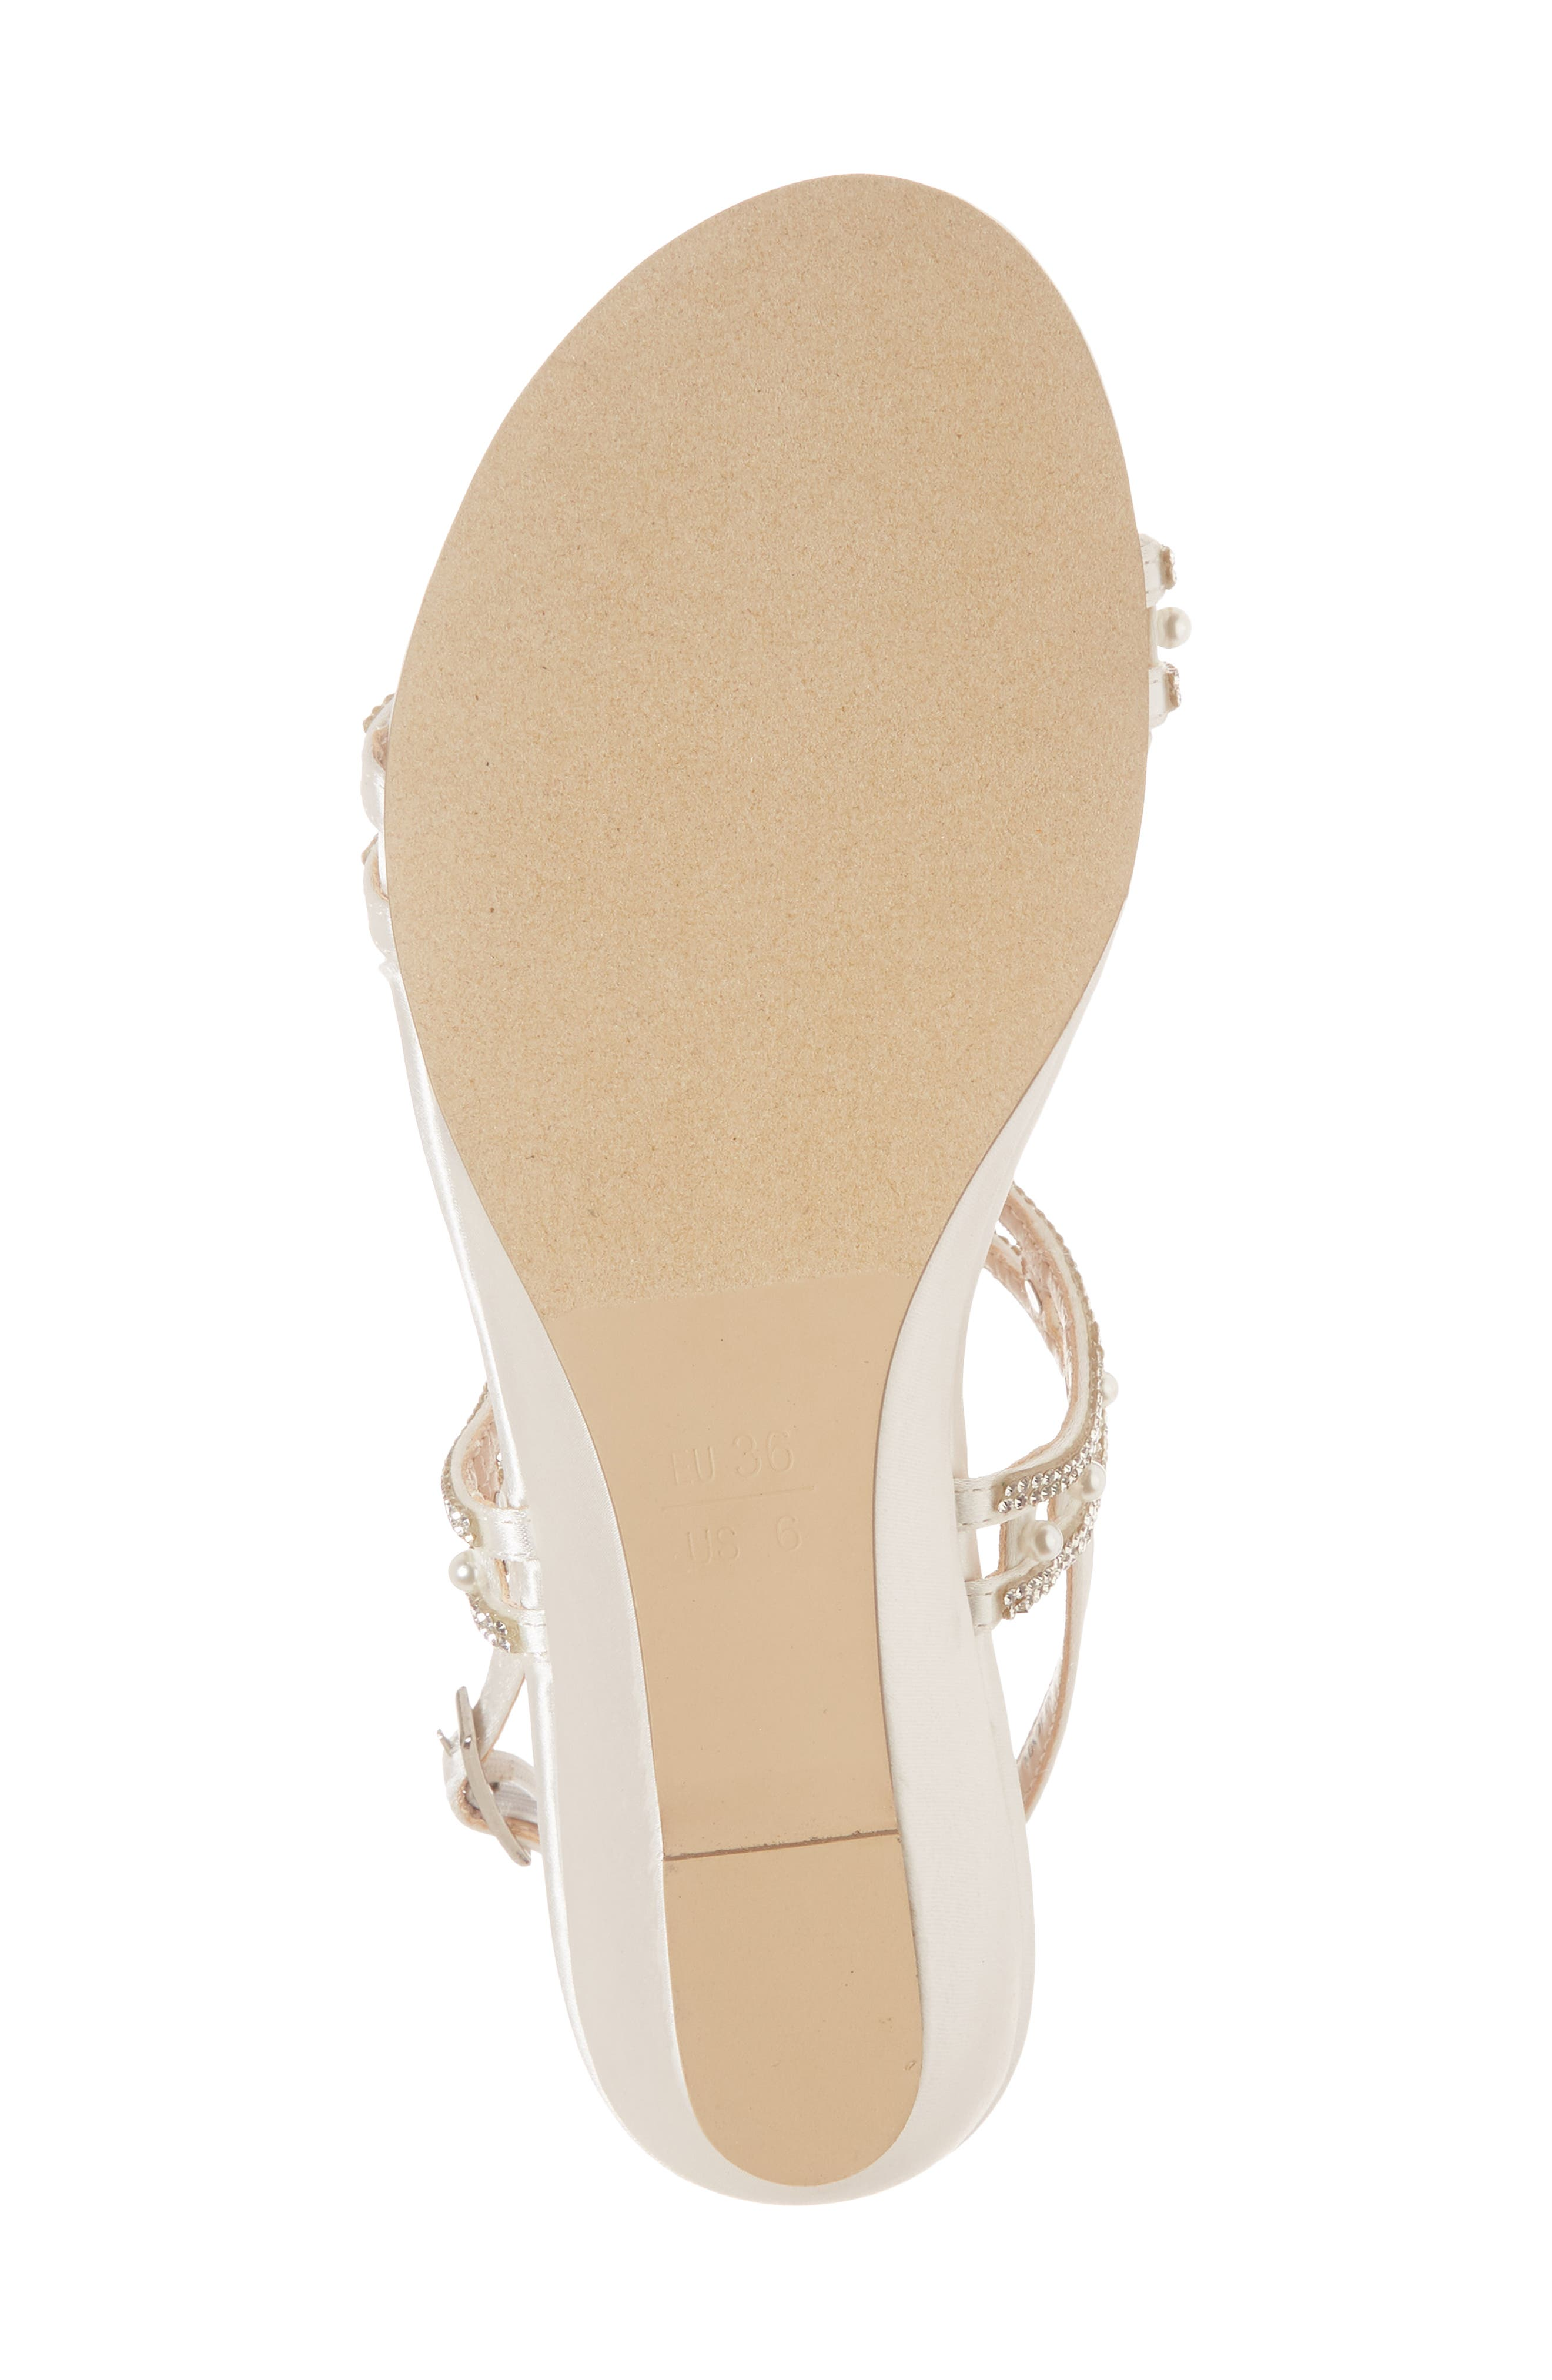 Kamara Embellished Wedge Sandal,                             Alternate thumbnail 6, color,                             Ivory Satin